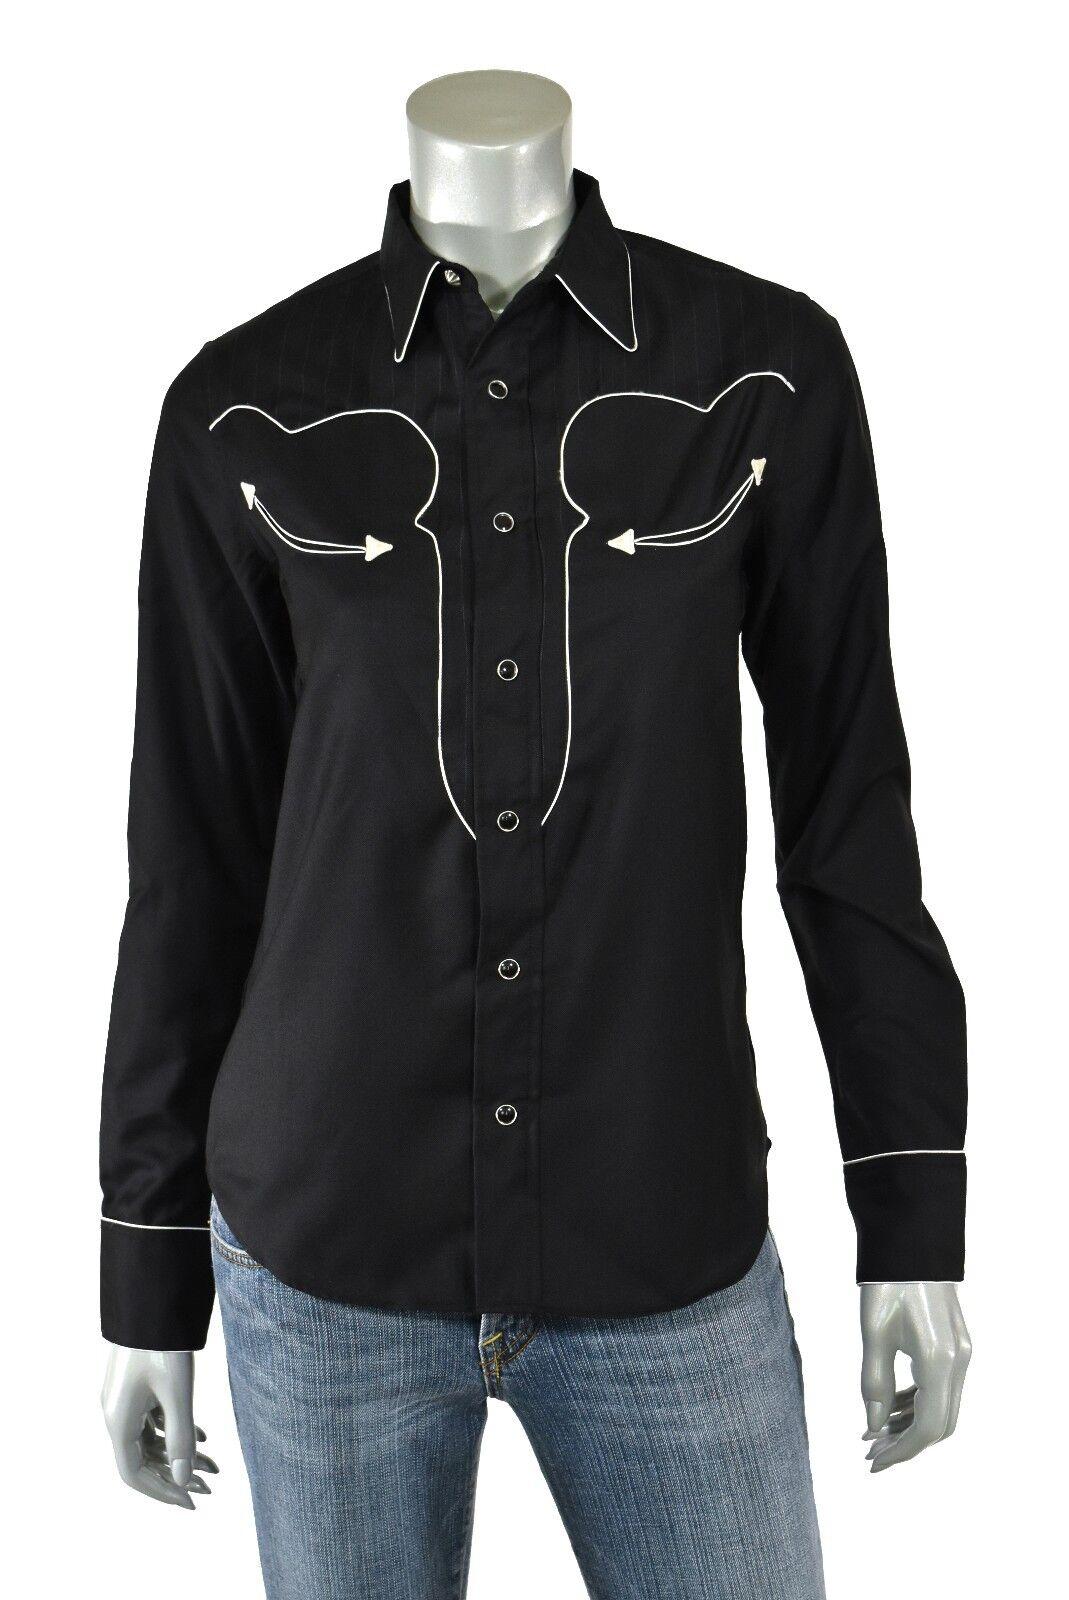 Woherren Ralph Lauren RRL schwarz Wool Western Shirt New